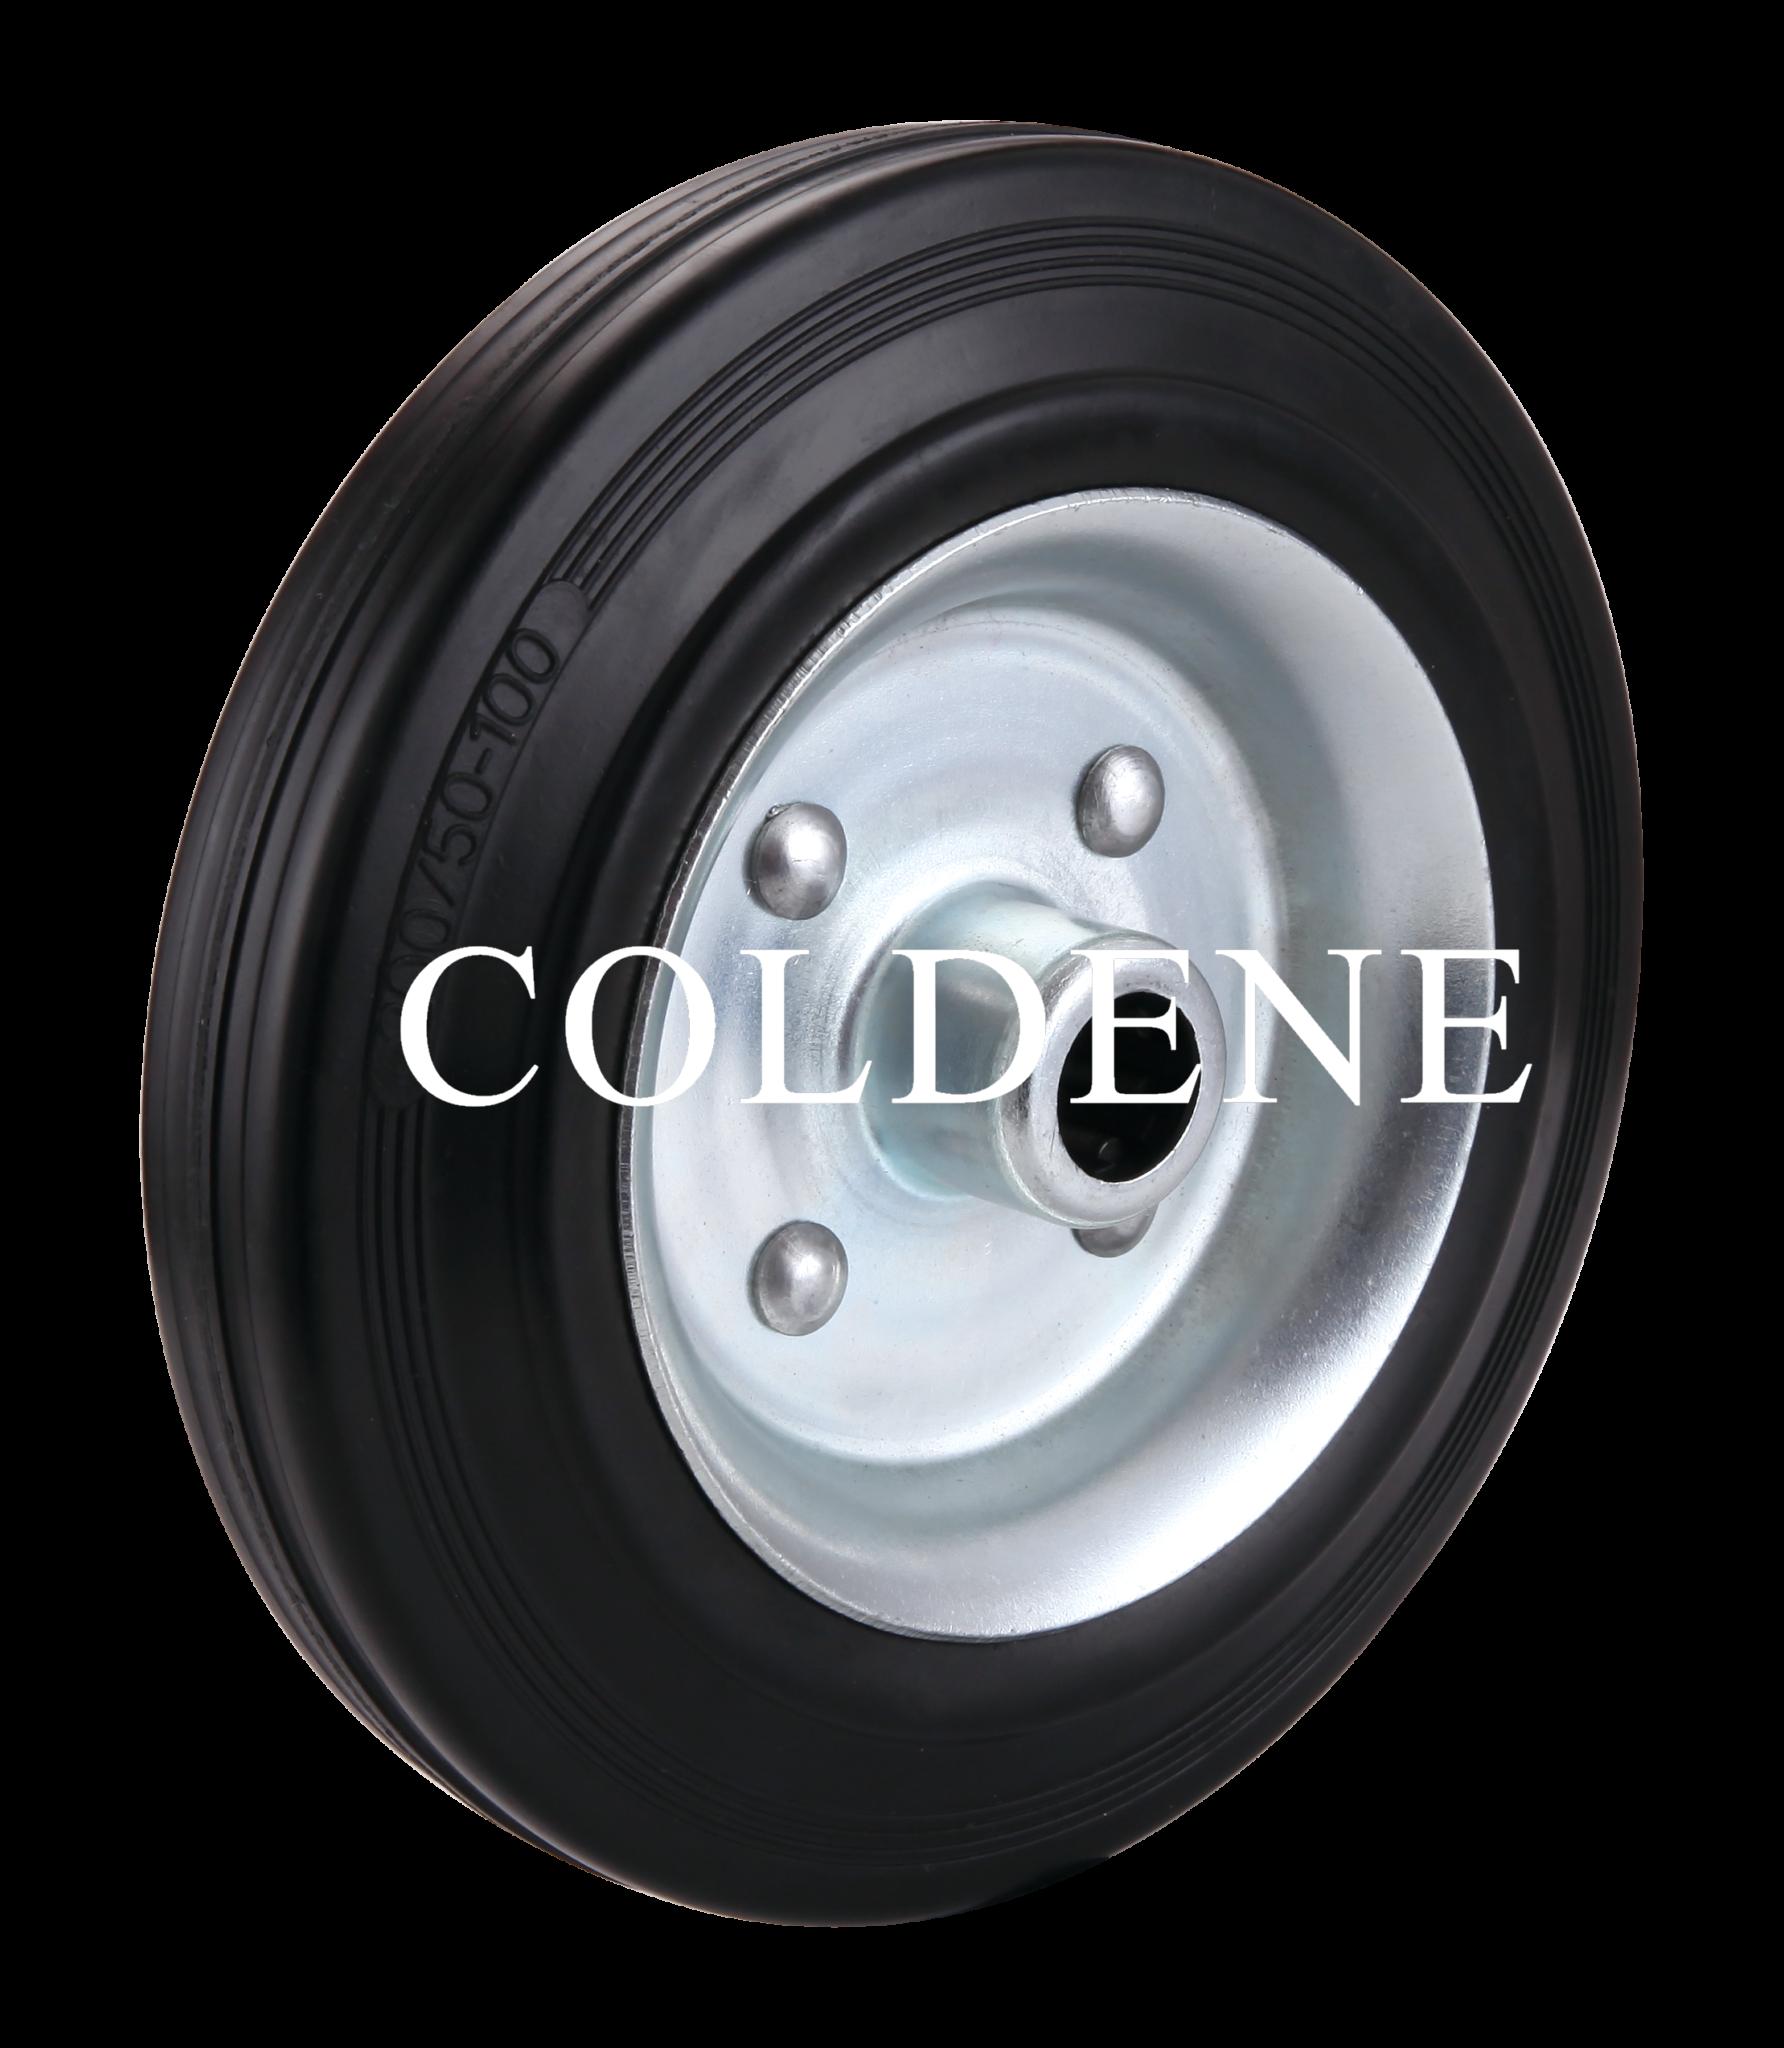 Black Rubber Pressed Steel Centre Wheel